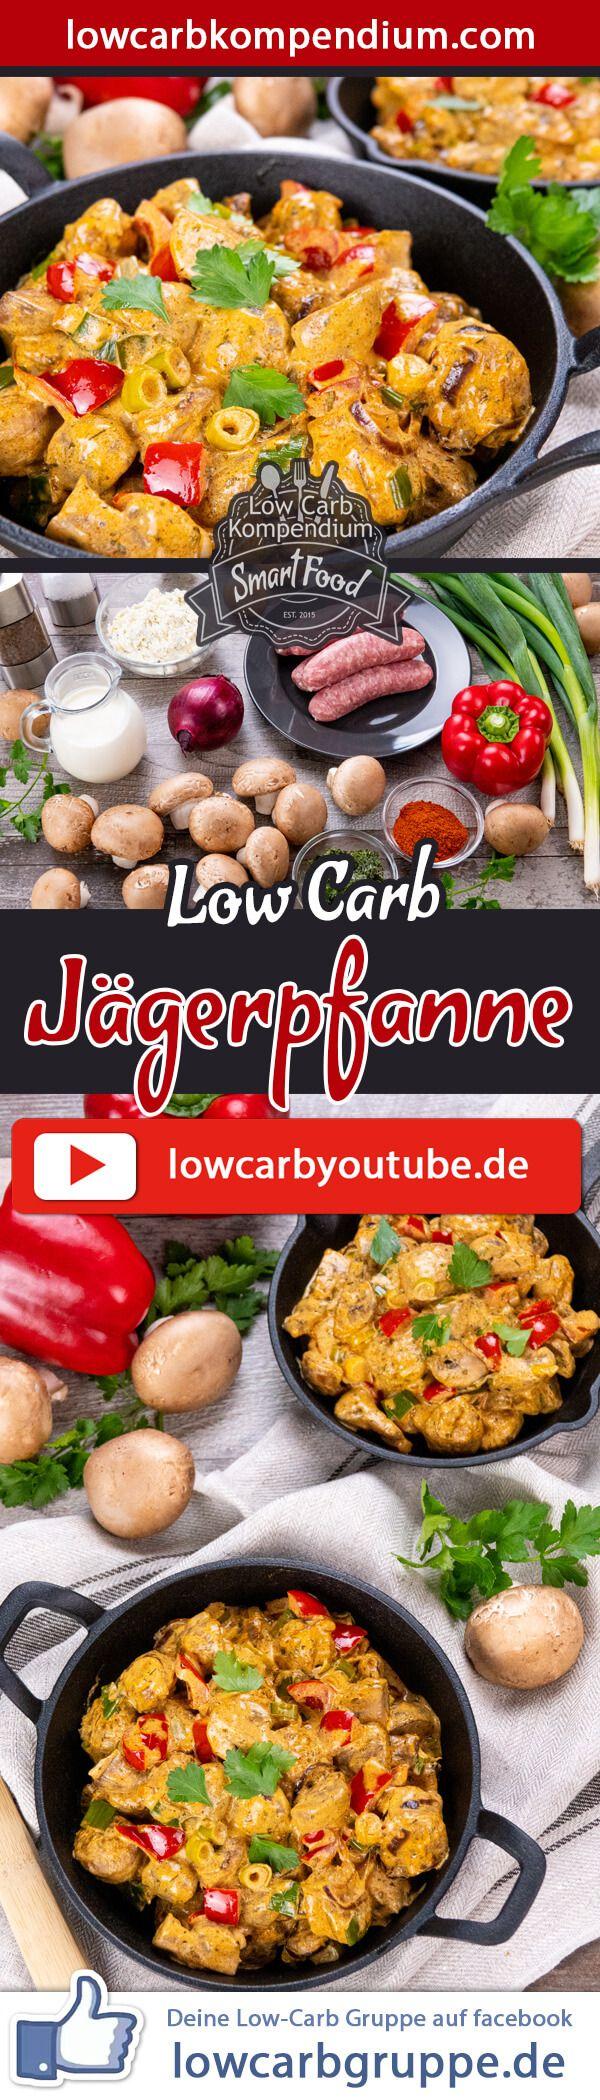 Jägerpfanne � Low-Carb & so lecker würzig-cremig �